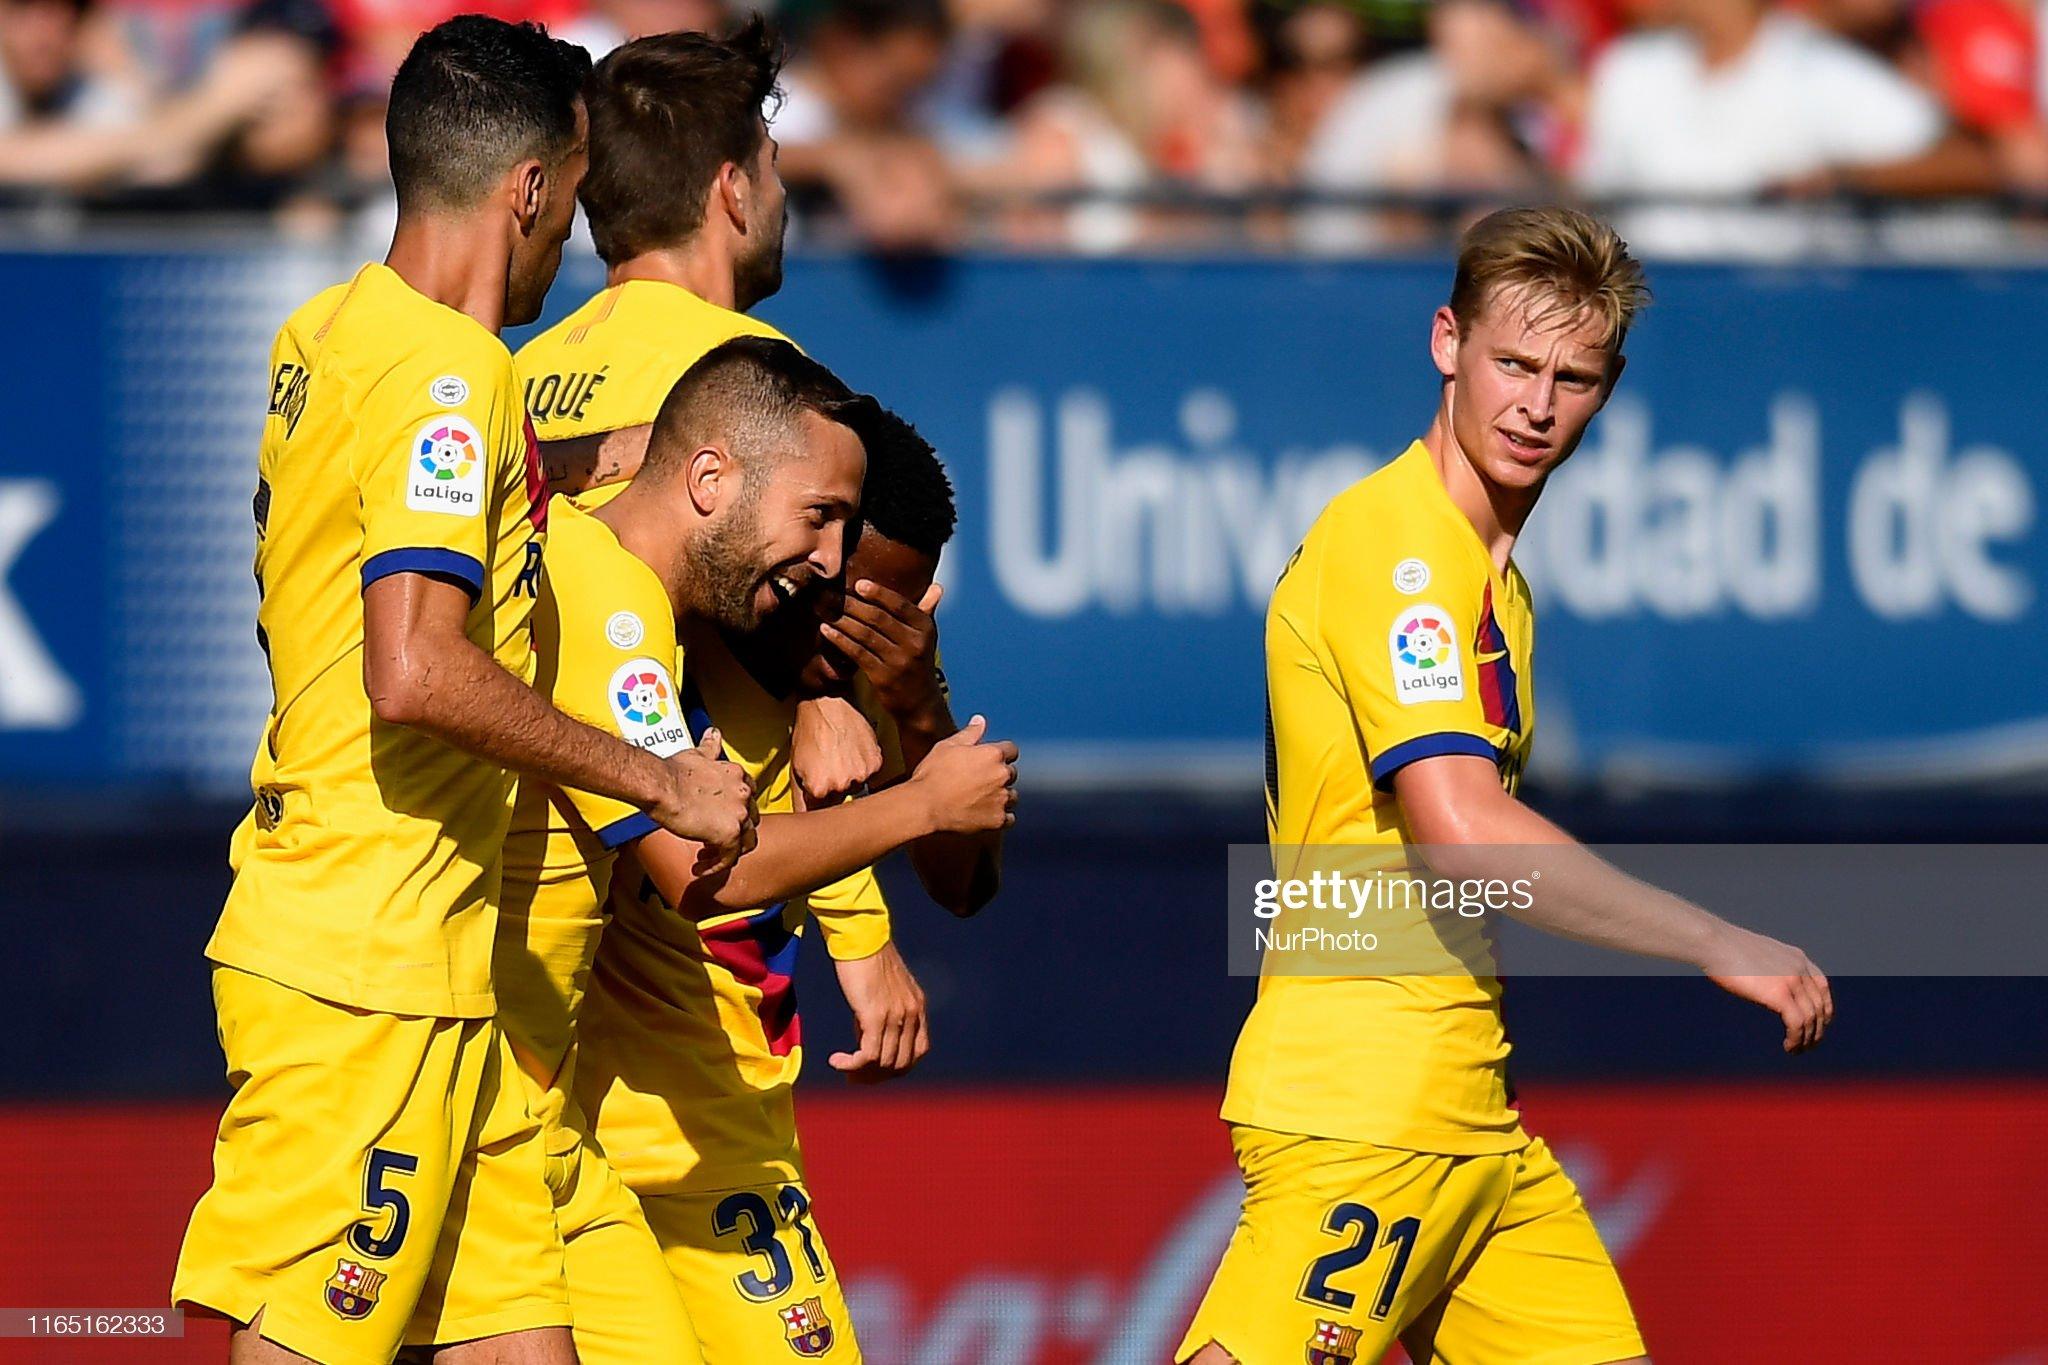 صور مباراة : أوساسونا - برشلونة 2-2 ( 31-08-2019 )  Ansu-fati-of-barcelona-celebrates-after-scoring-his-sides-first-goal-picture-id1165162333?s=2048x2048